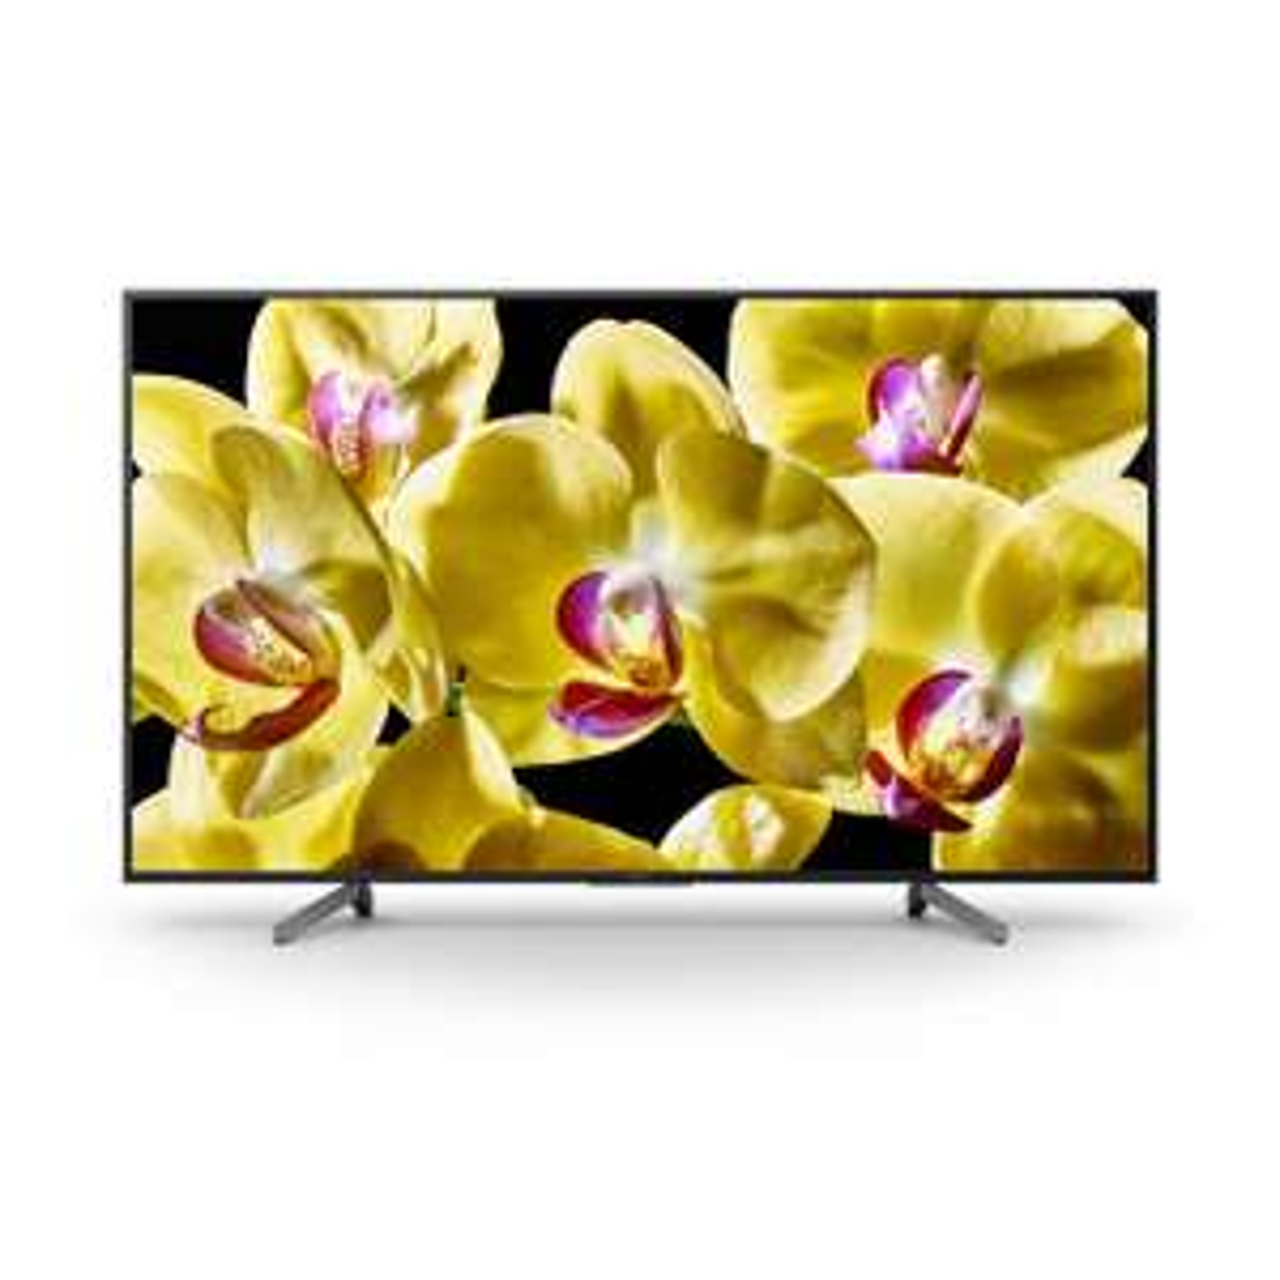 Sony KD-55XG8096 Refurbished 4K HDR TV (Refurb) £399 @ Centres Direct